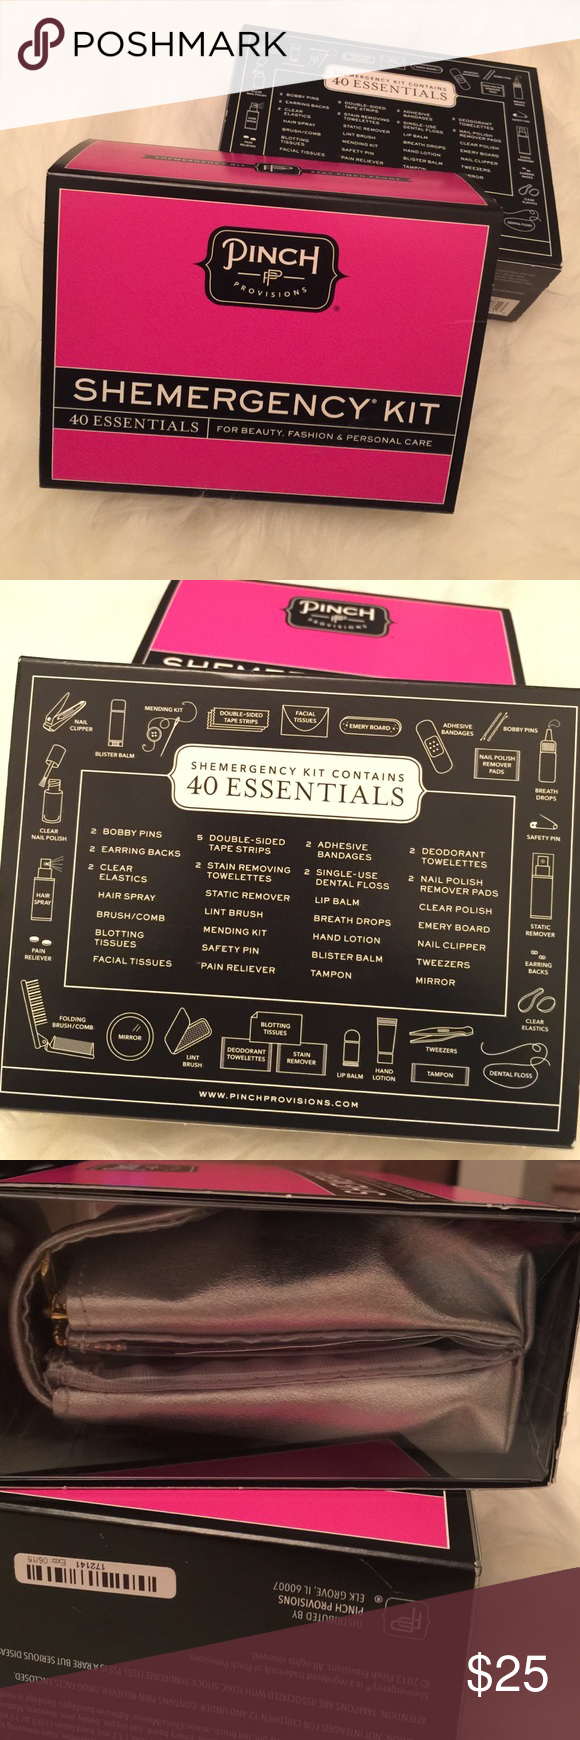 SALE💥💥 Shemergency Kit (40 piece) Beauty, Personal